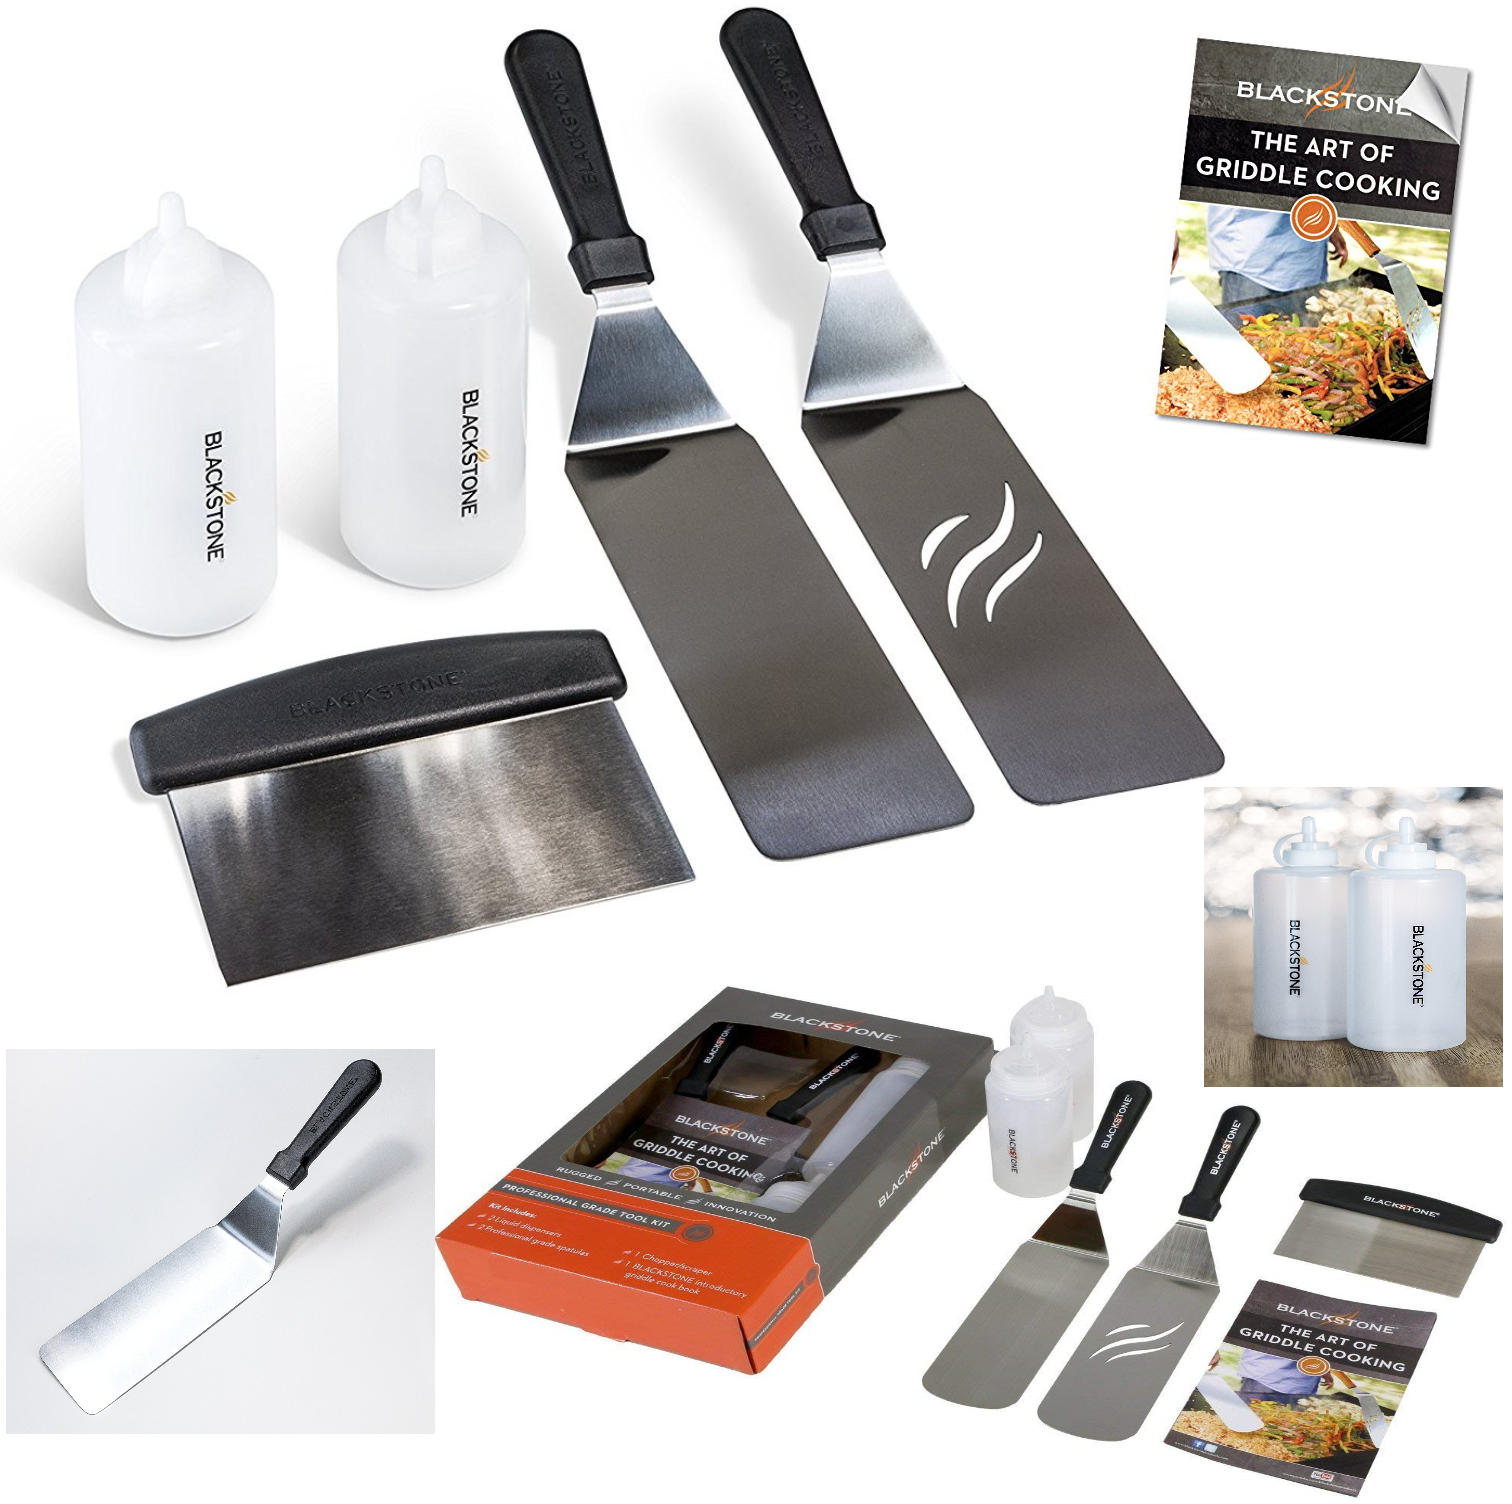 Professional Blackstone Griddle Spatula Kit Accessory Grill